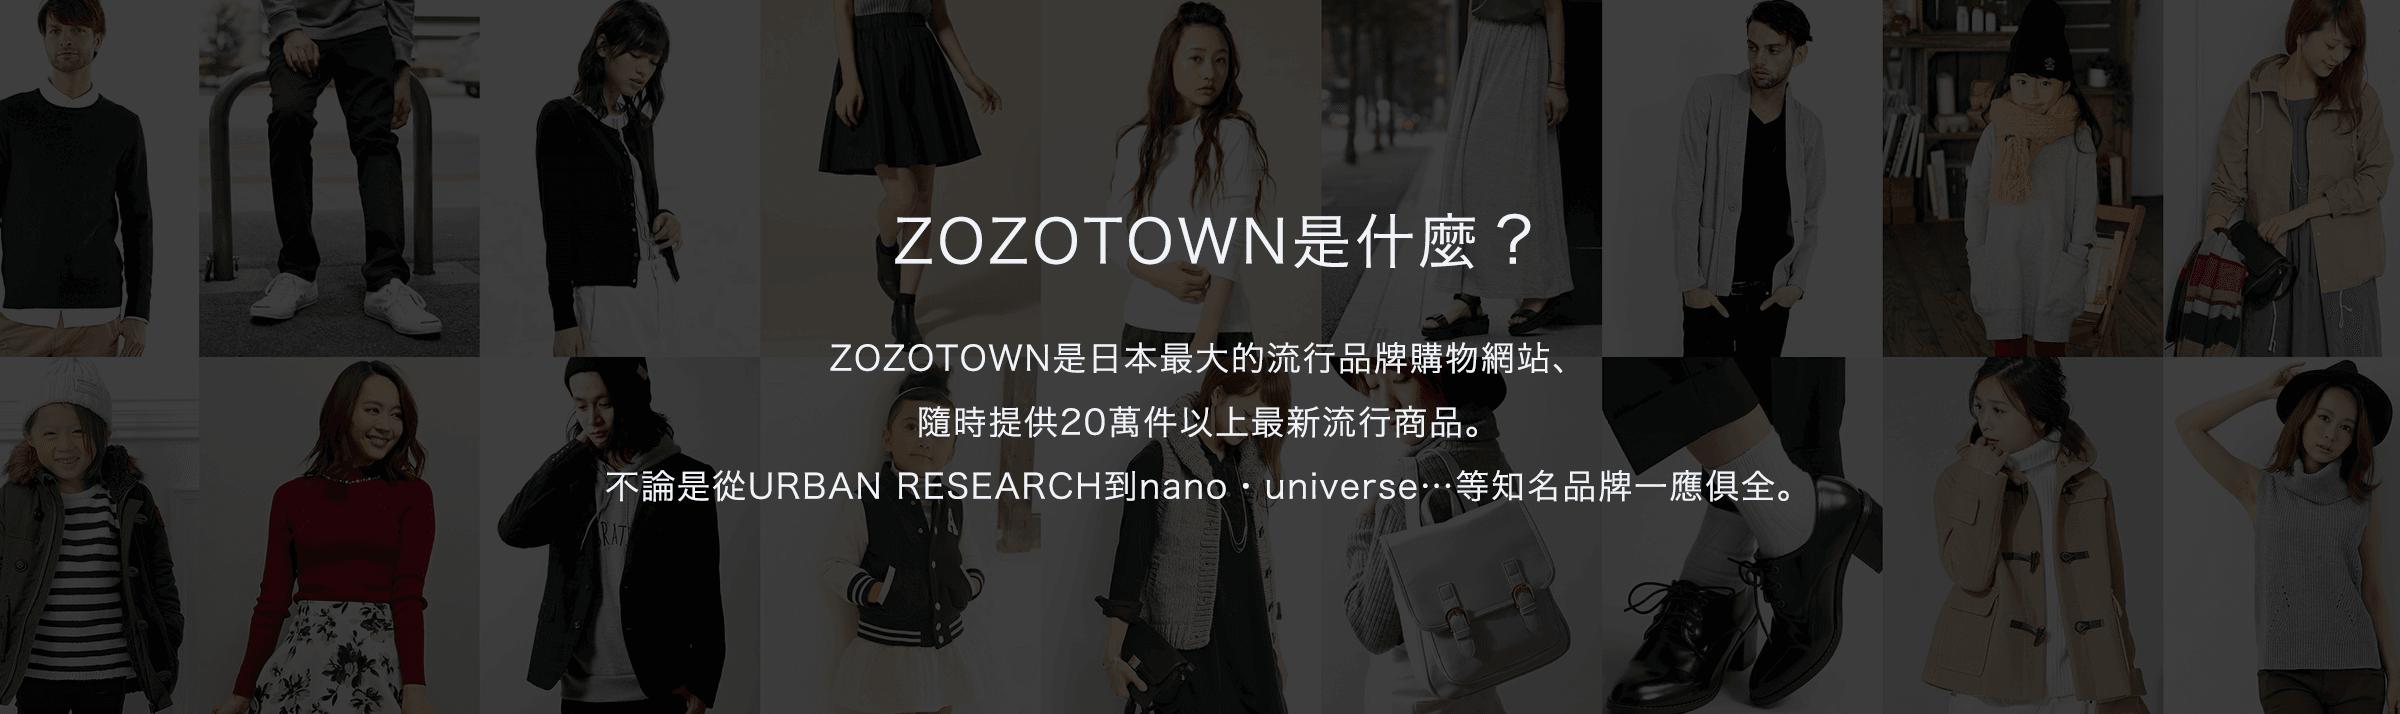 ZOZOTOWN是日本最大的流行品牌購物網站、隨時提供20萬件以上最新流行商品。不論是從URBAN RESEARCH到nano・universe…等知名品牌一應俱全。